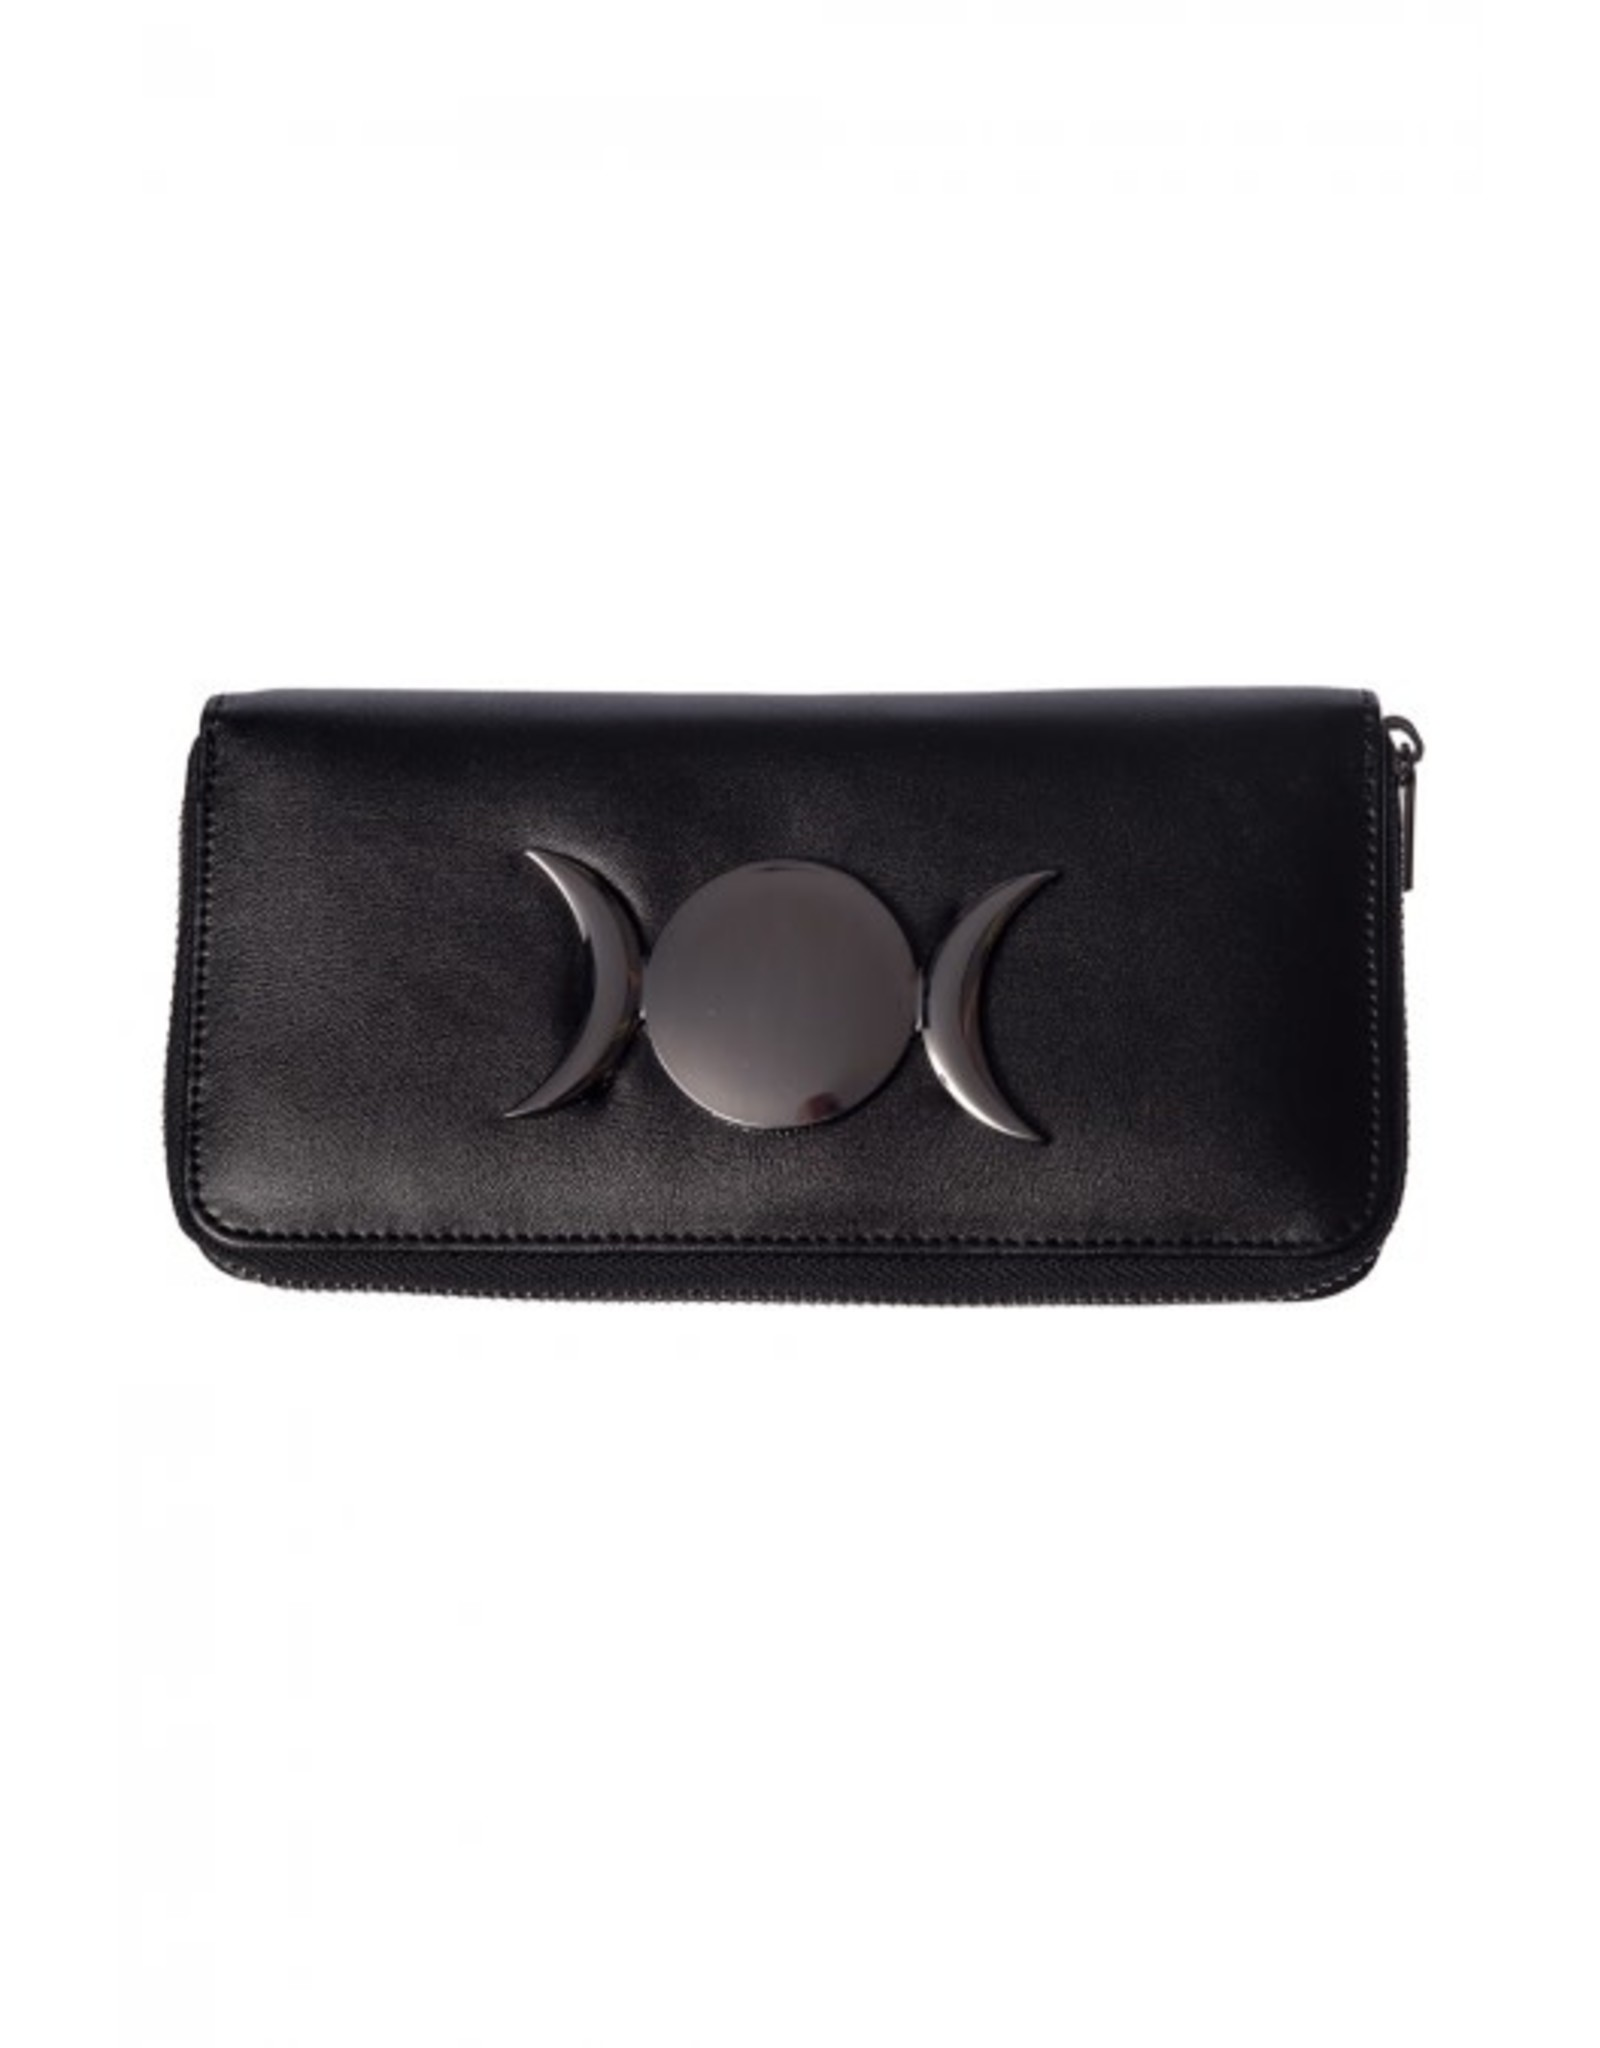 BANNED - Vidonia Triple Moon Wallet